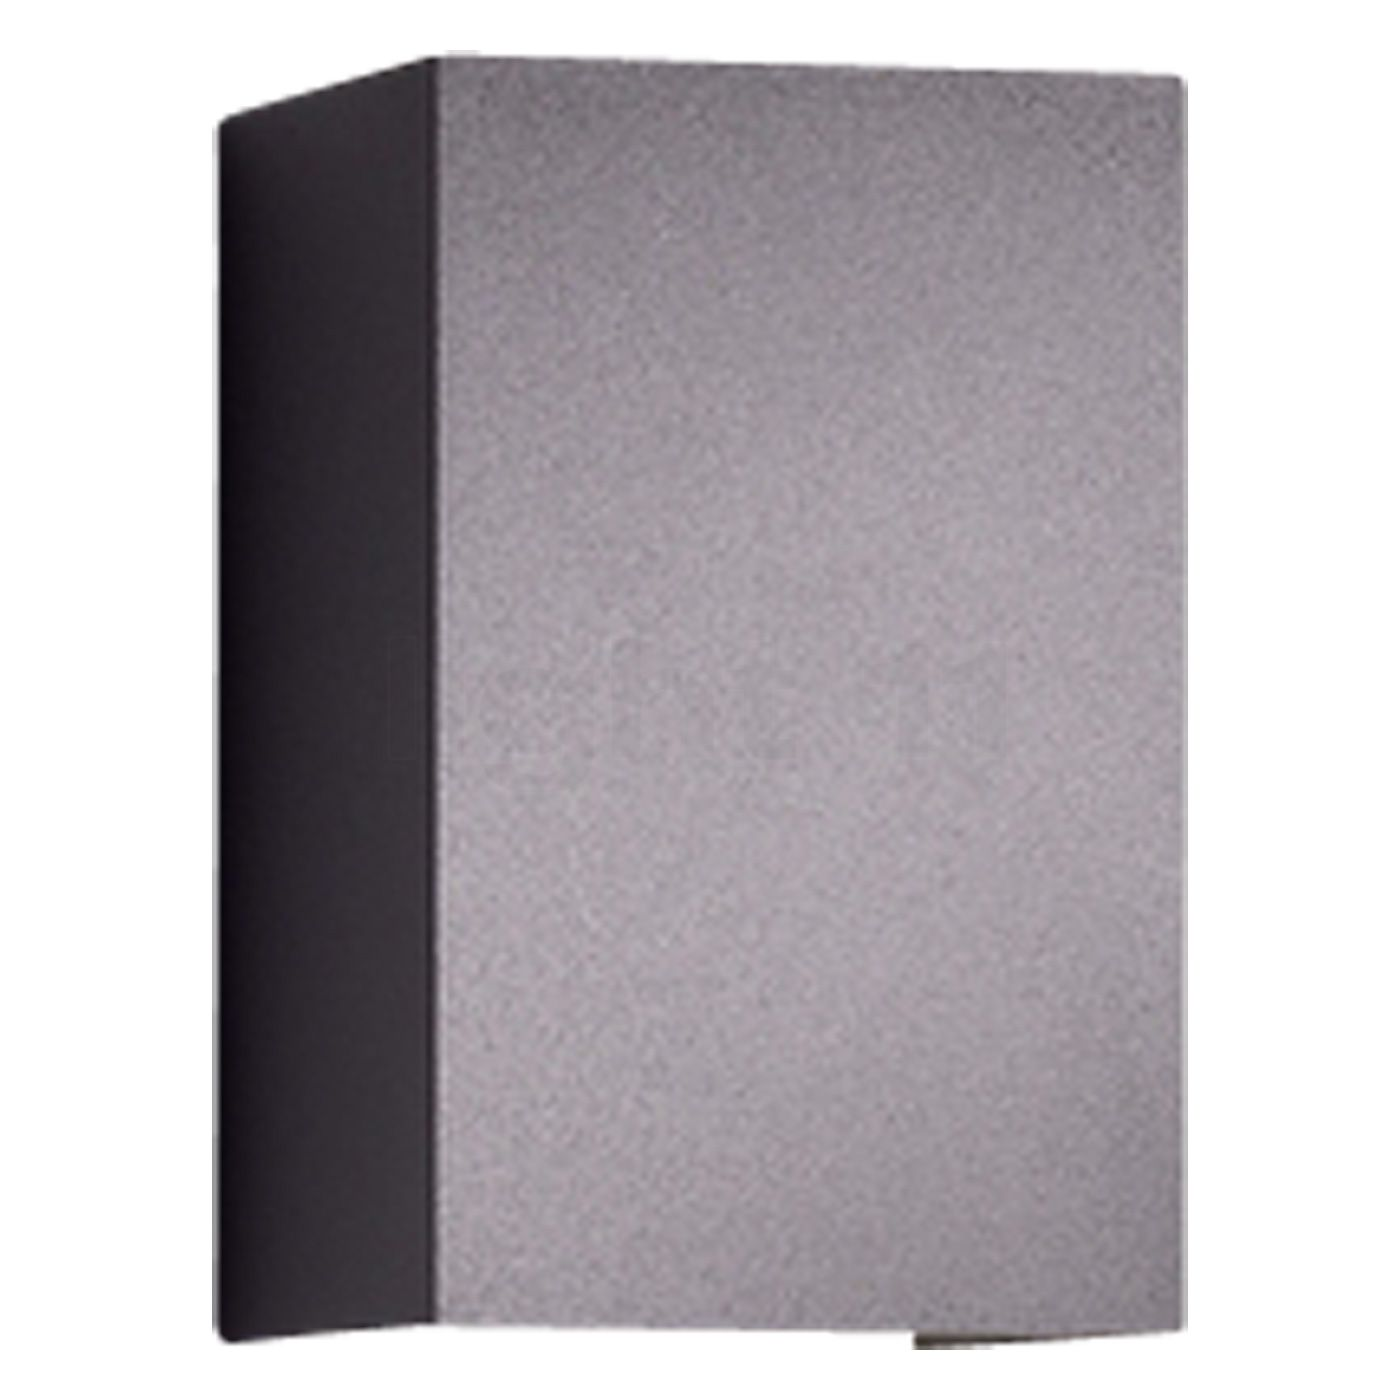 delta light nanoo ww wandleuchte kaufen bei. Black Bedroom Furniture Sets. Home Design Ideas